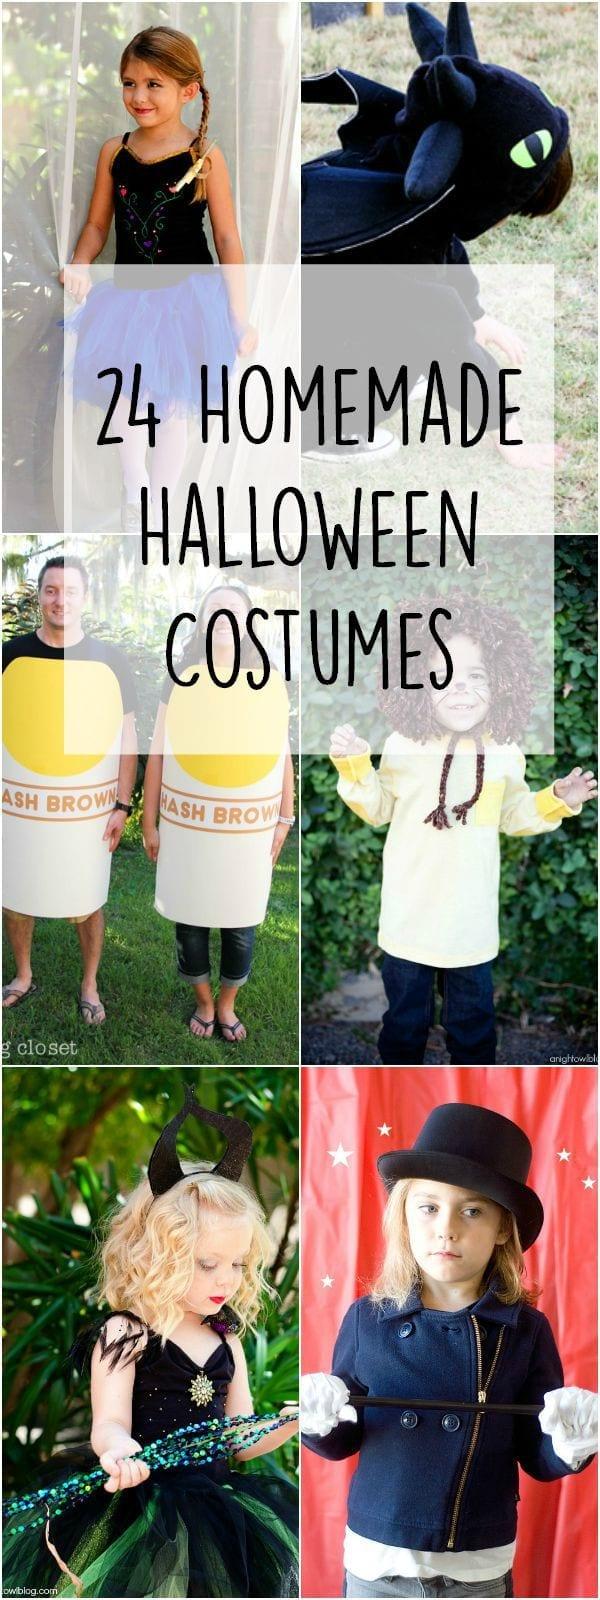 24 homemade Halloween costumes